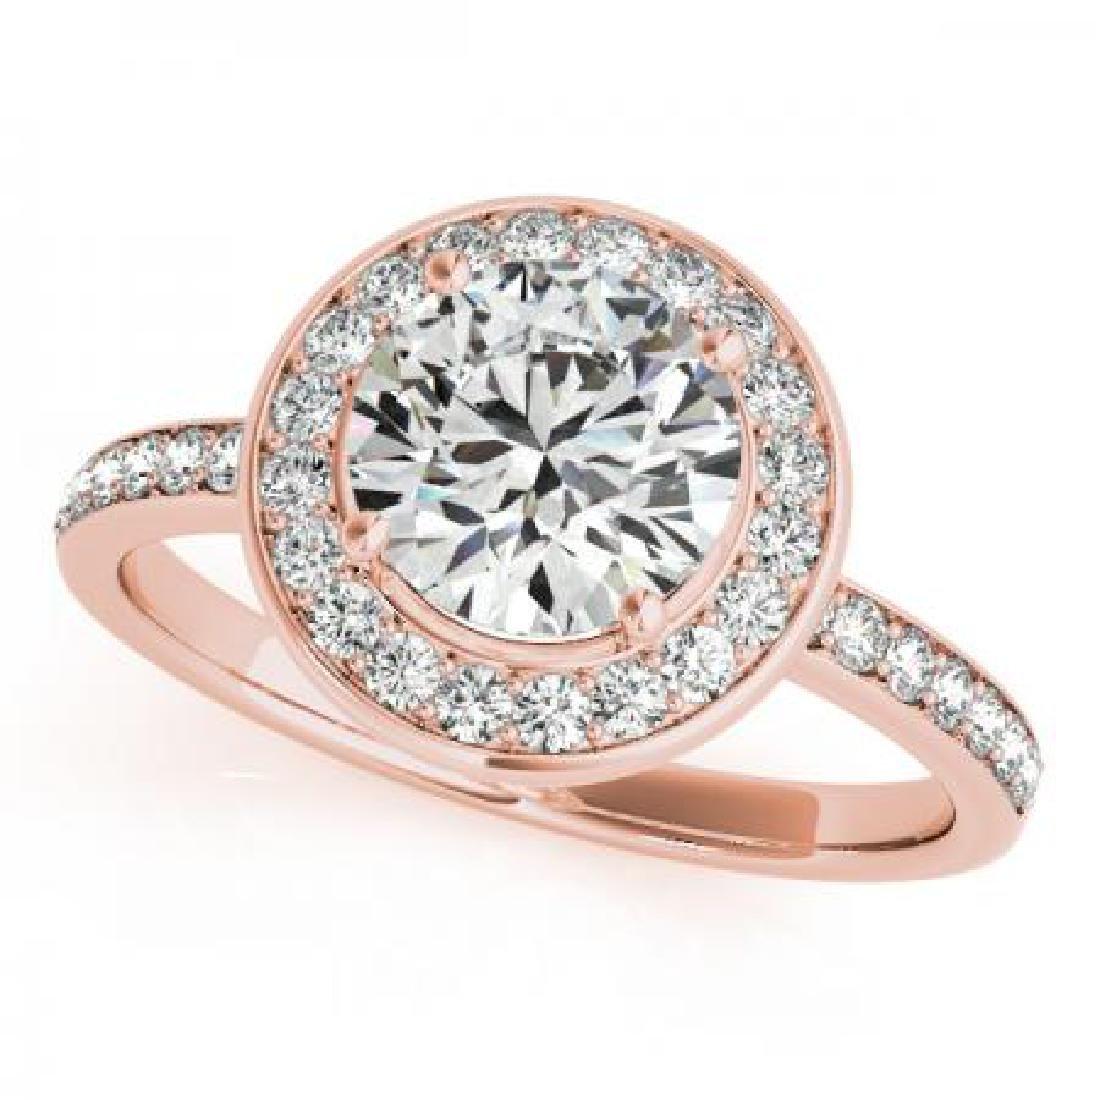 CERTIFIED 18K ROSE GOLD 1.54 CT G-H/VS-SI1 DIAMOND HALO